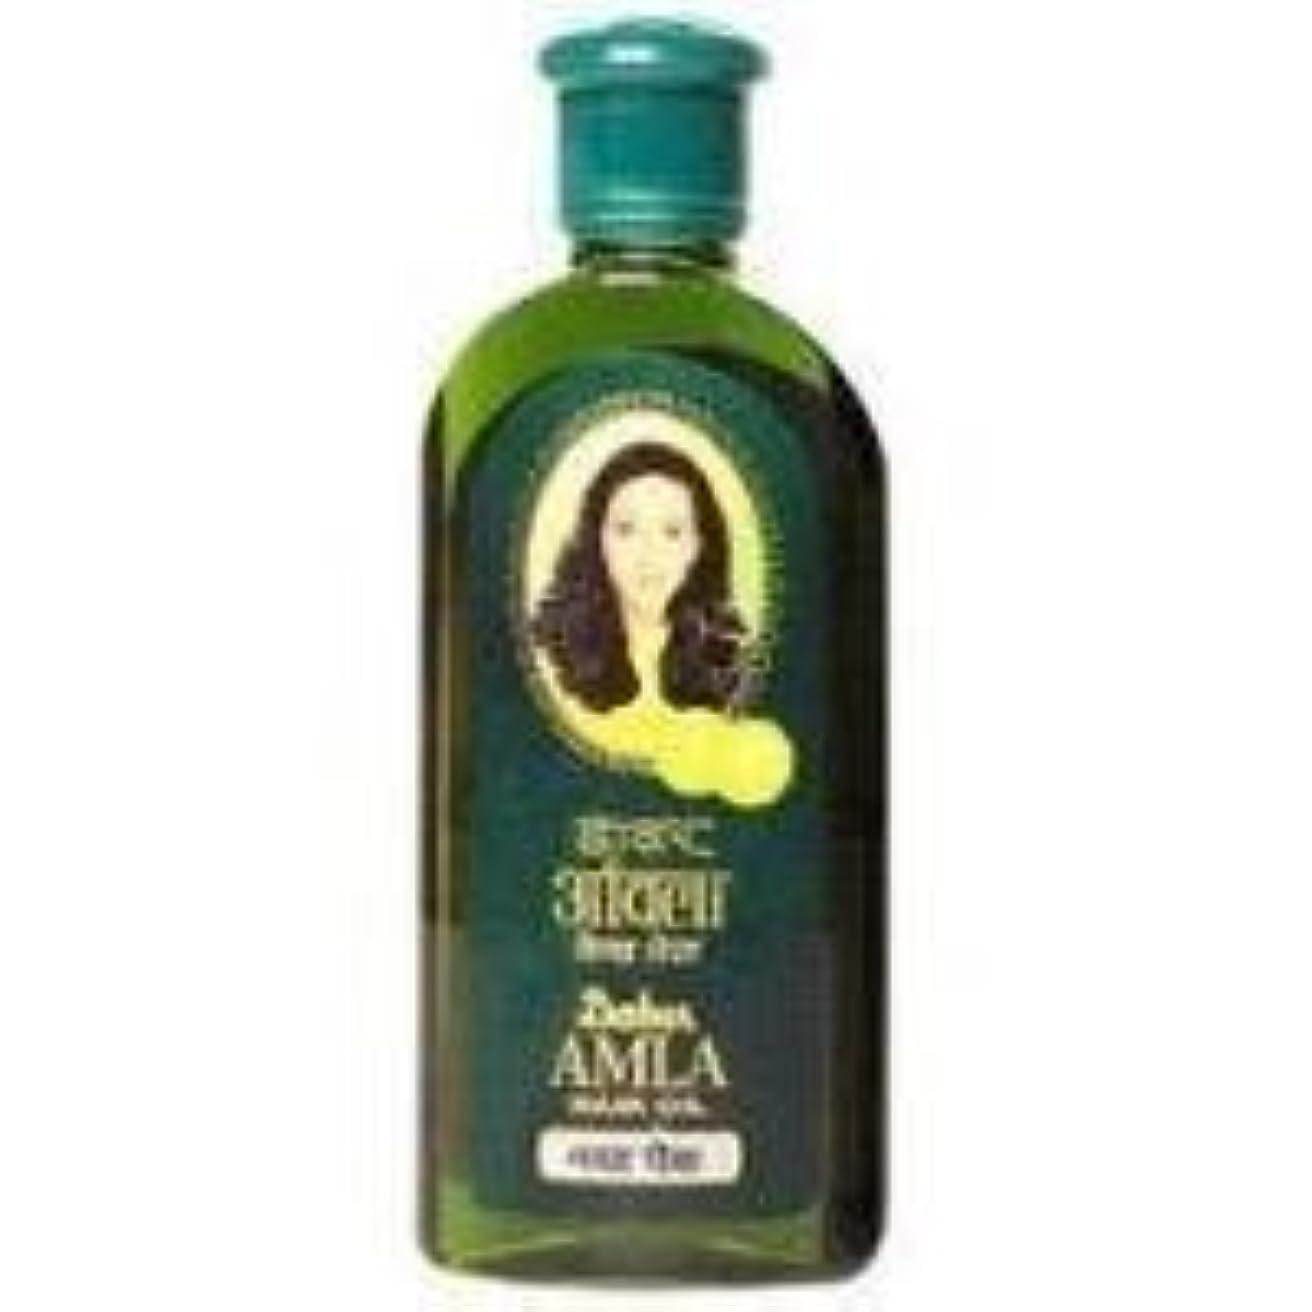 手配する平方信頼性Dabur Amla Hair Oil, 500 ml Bottle by Dabur [並行輸入品]